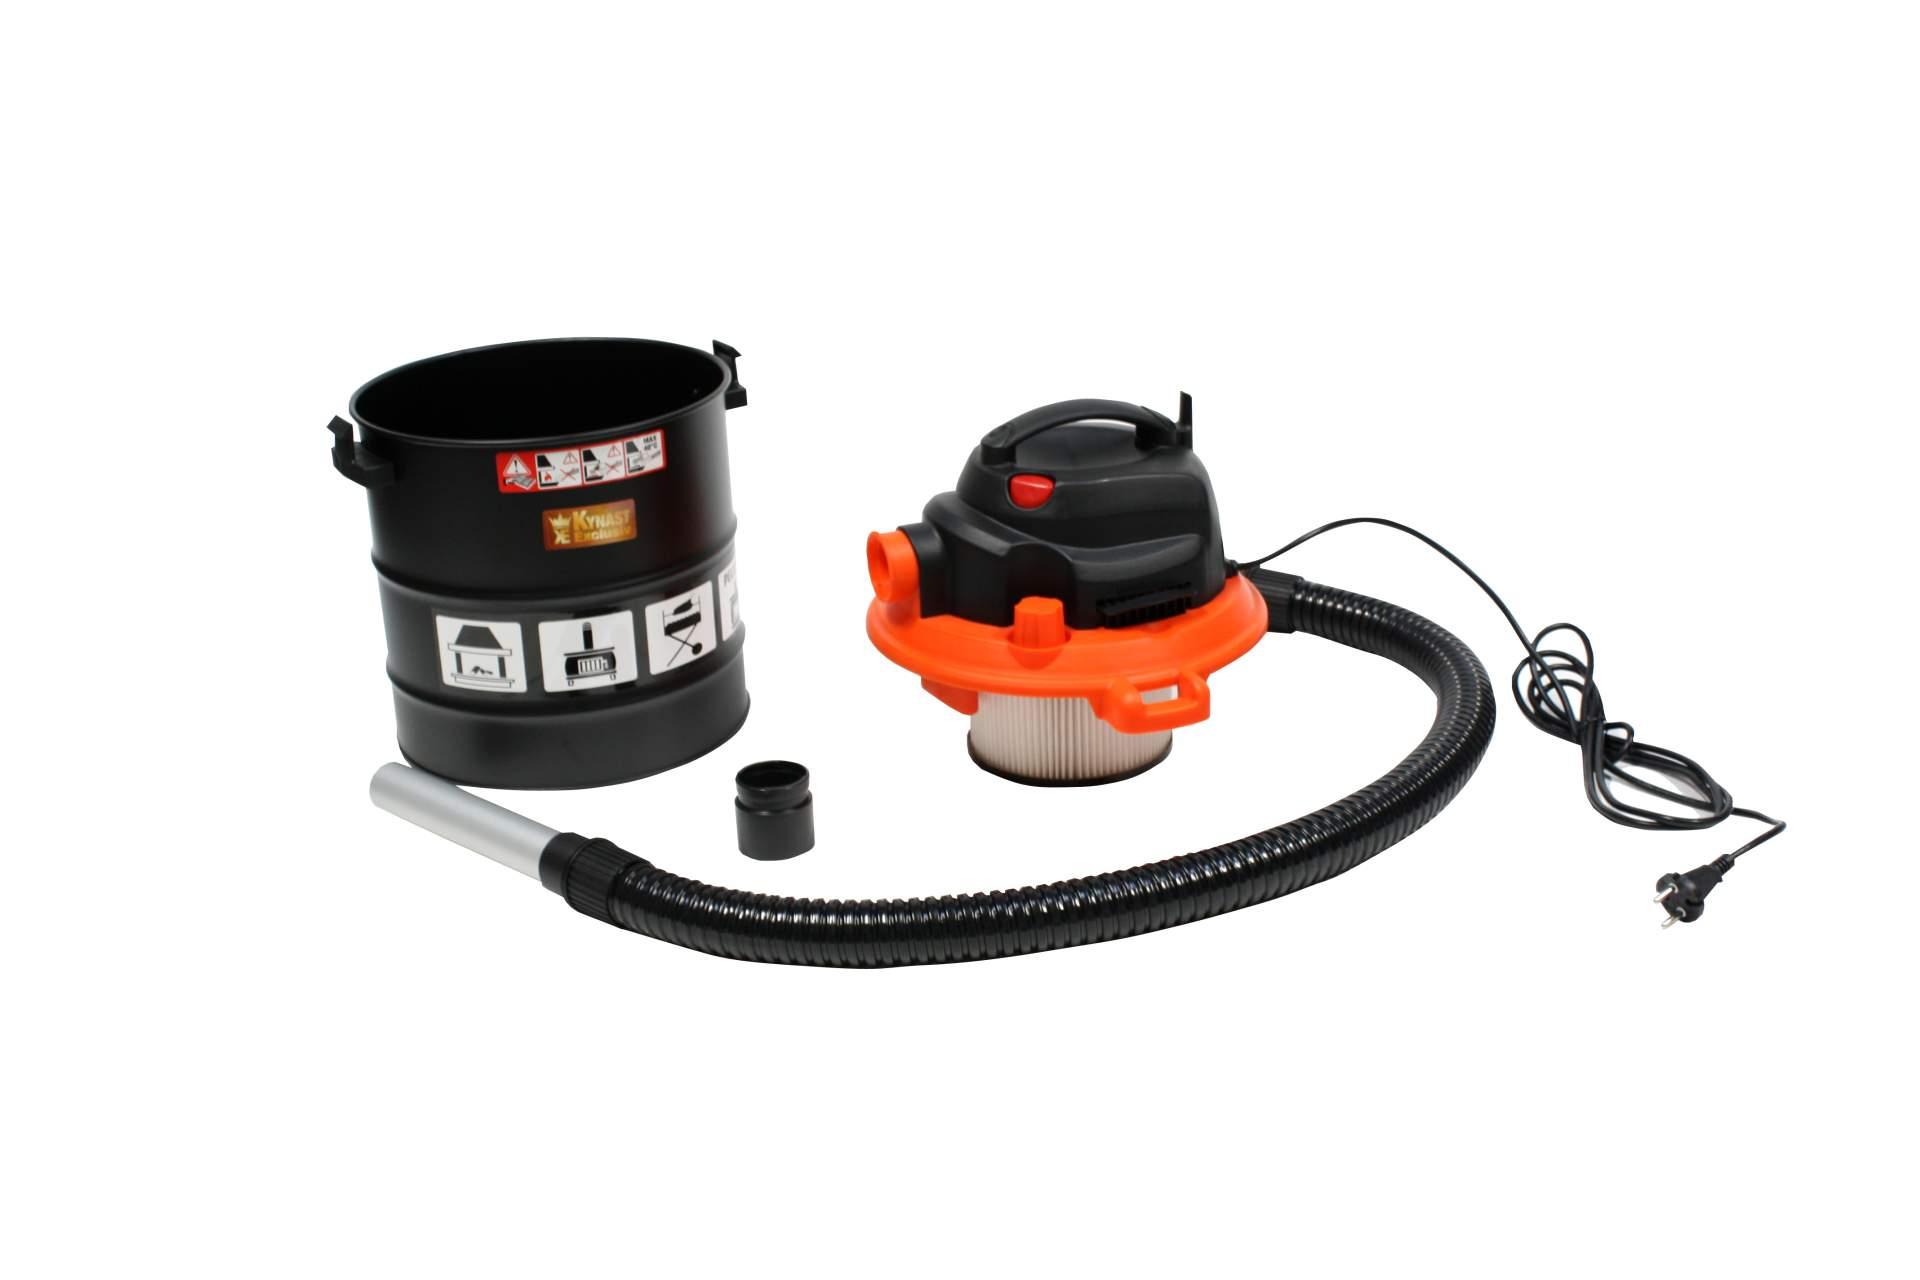 kamin aschesauger 18 l volumen 1000 watt asche elektro sauger schlauch 3 m kabel ebay. Black Bedroom Furniture Sets. Home Design Ideas